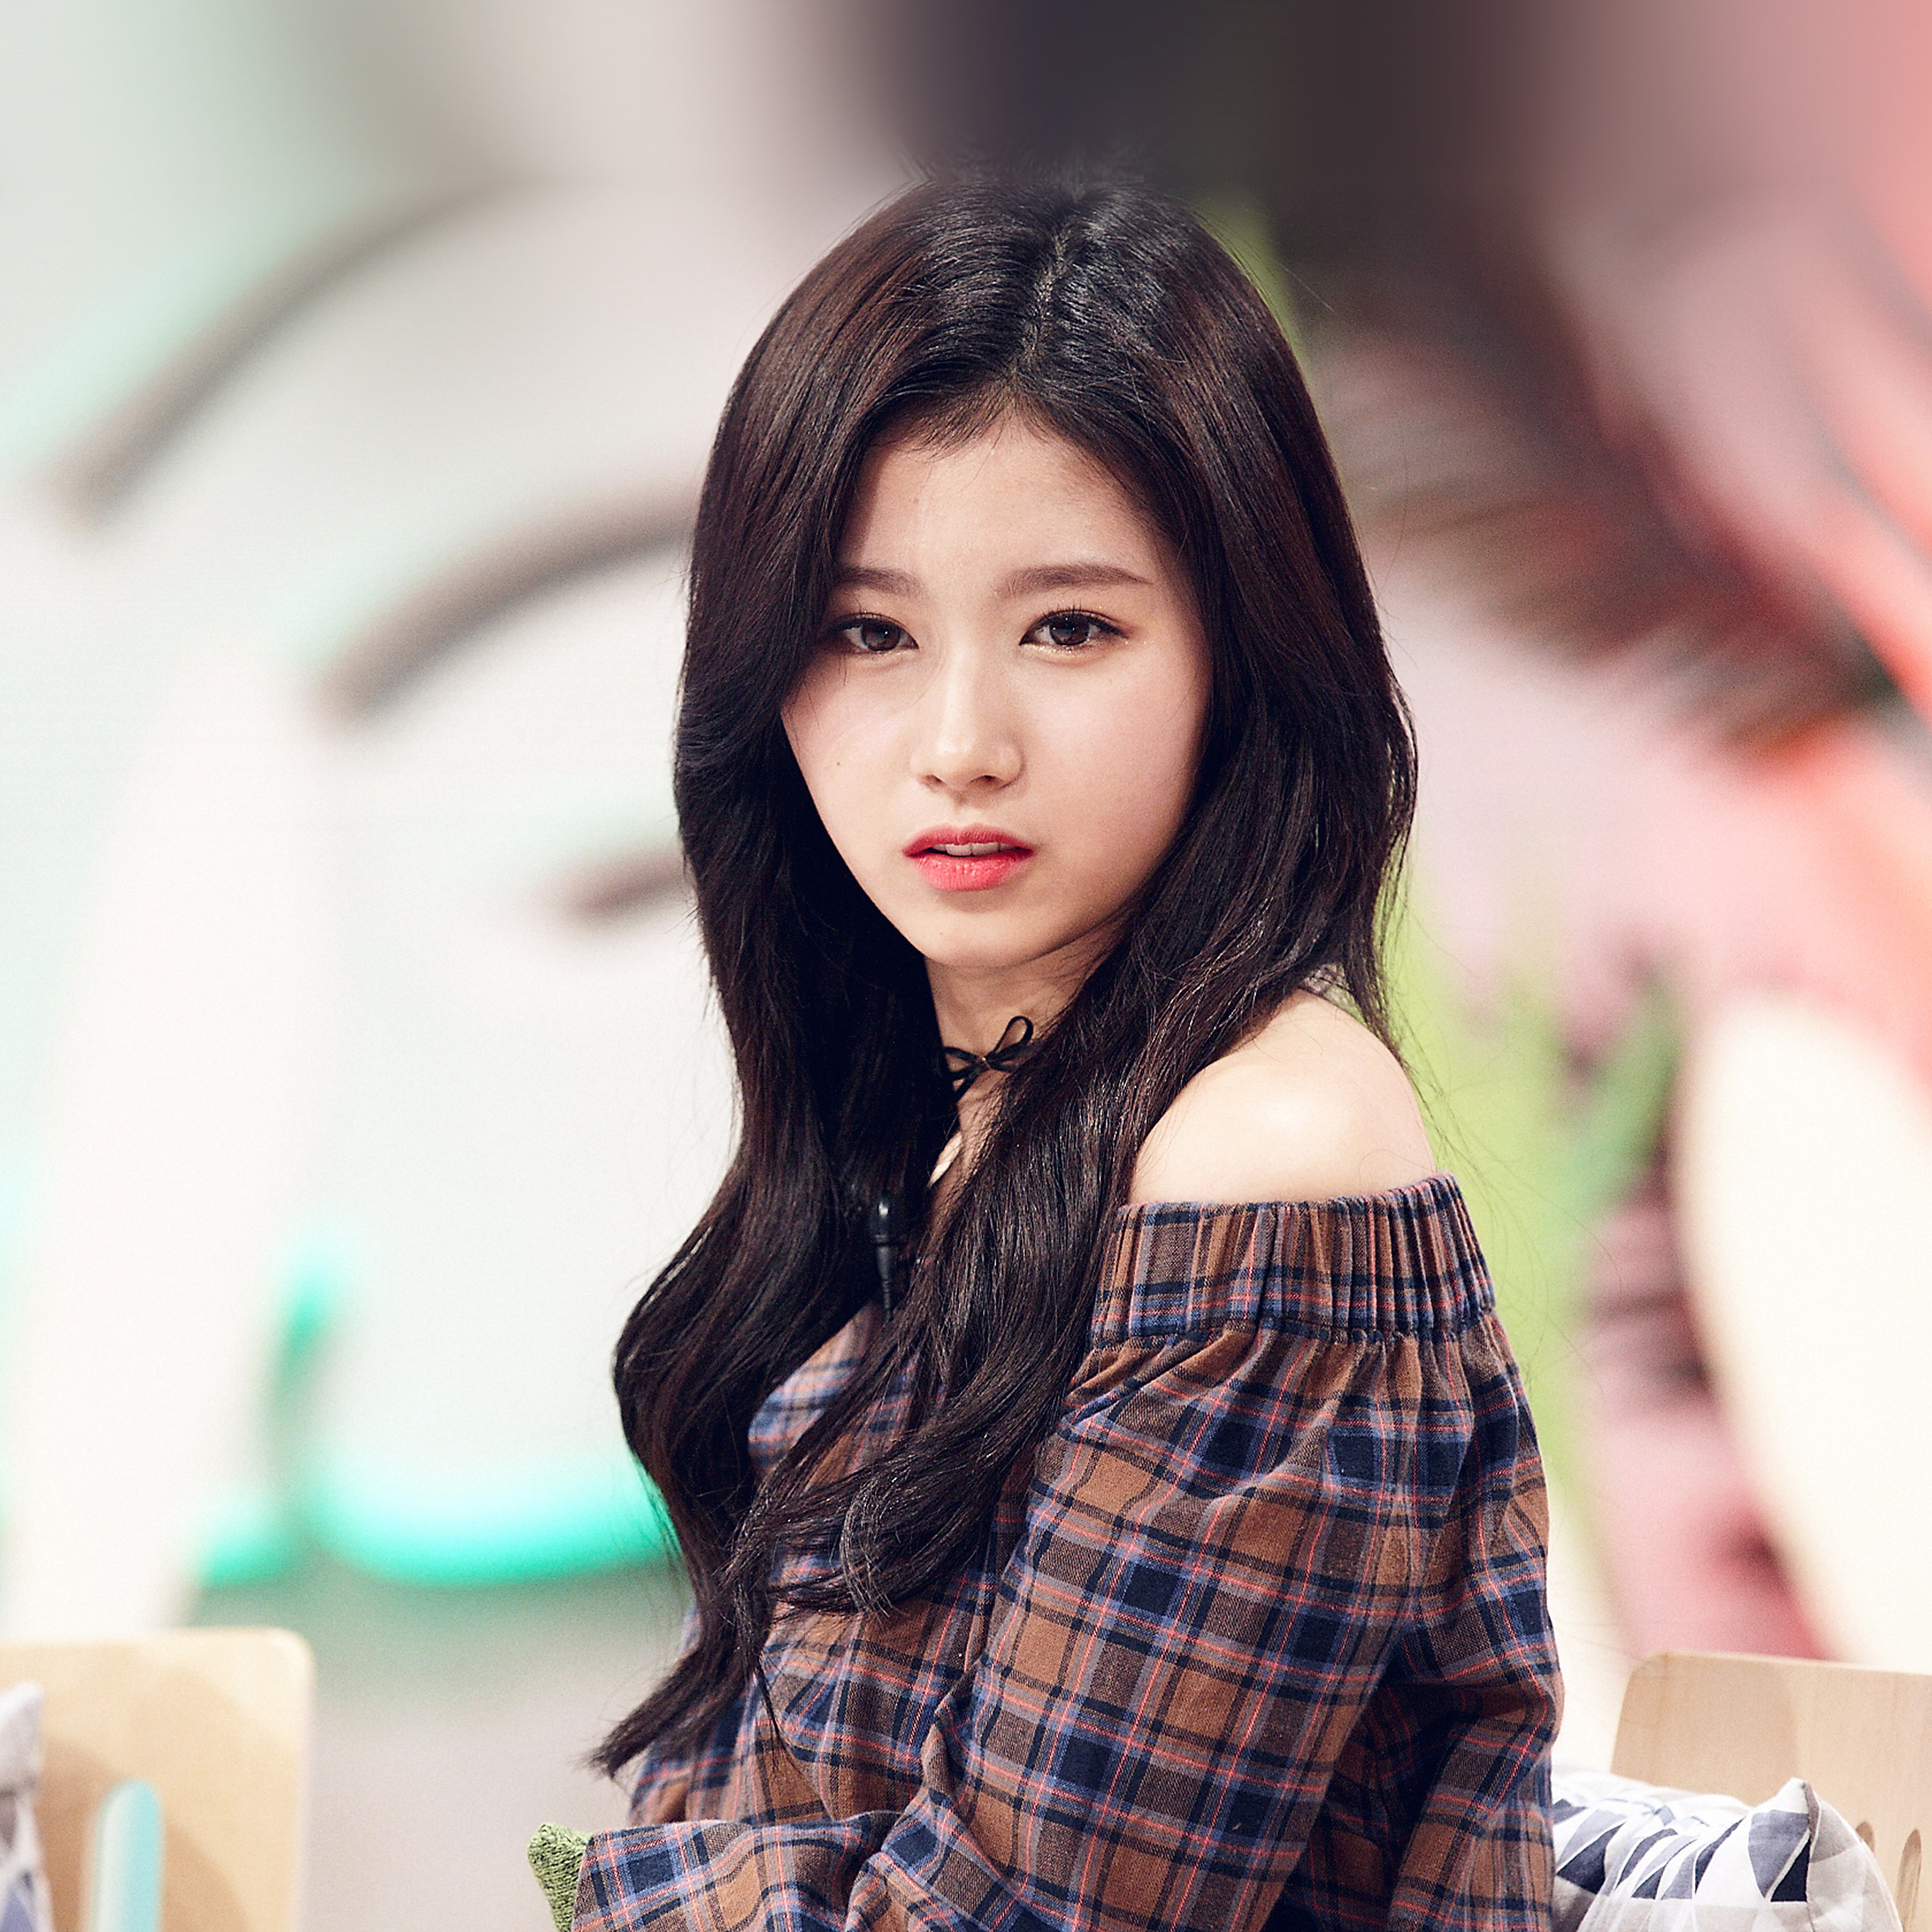 Sweet Girls Wallpaper: Hl09-sana-kpop-cute-girl-celebrity-wallpaper